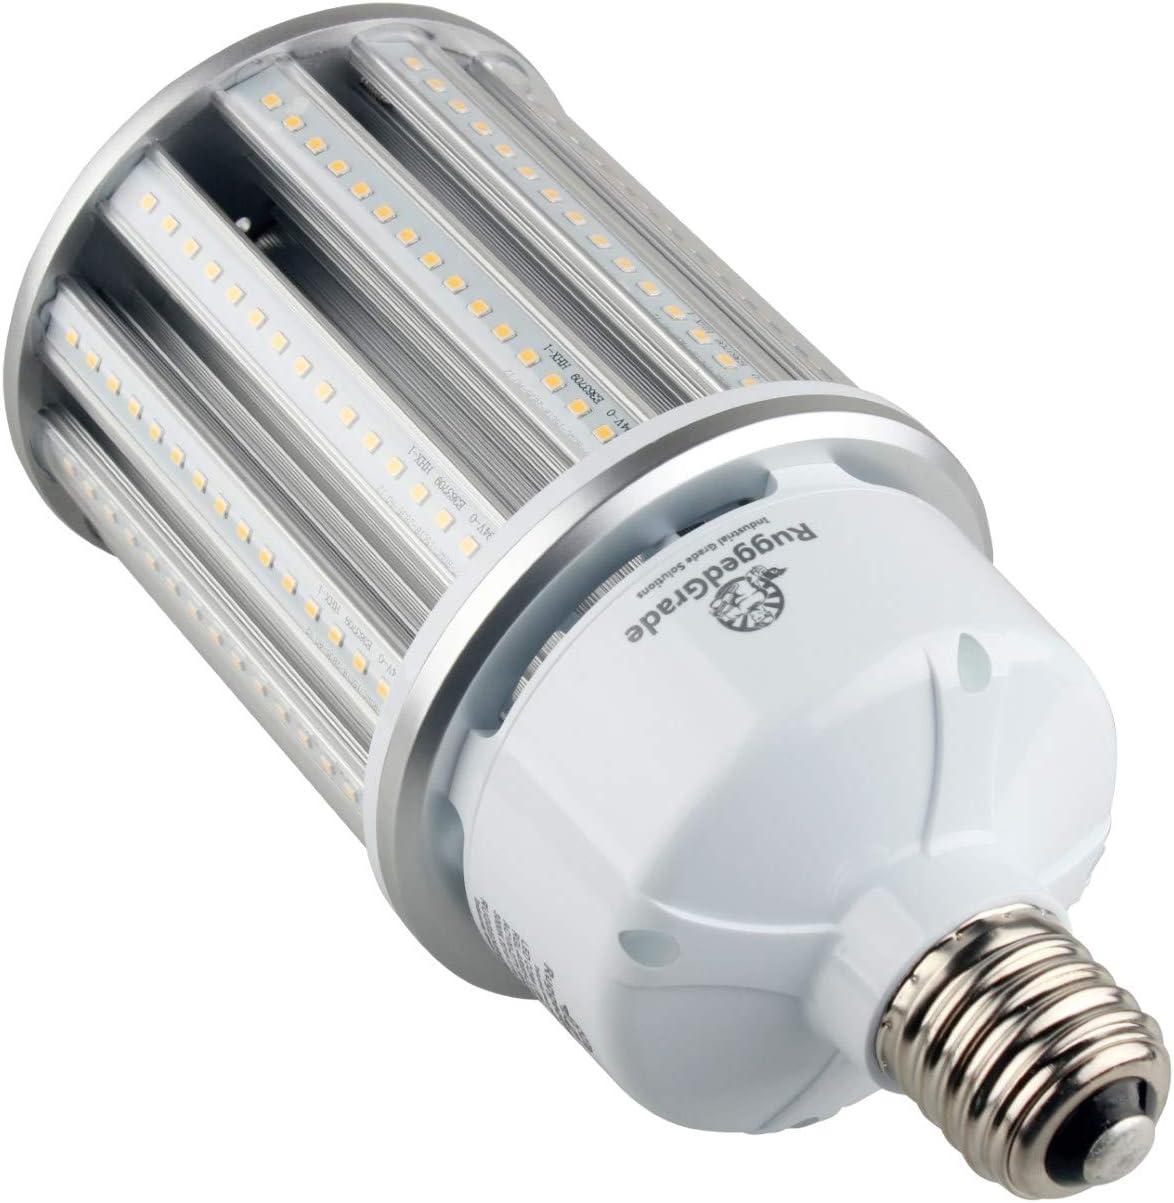 Aries S Series LED Corn Light Bulb 54 Watt LED Corn Light Bulb Mogul E39 Base 5000K Pure White 6KV Surge UL /& DLC 5 7400 Lumens Replacement for 125-175 watt HID//HPS//Metal Halide